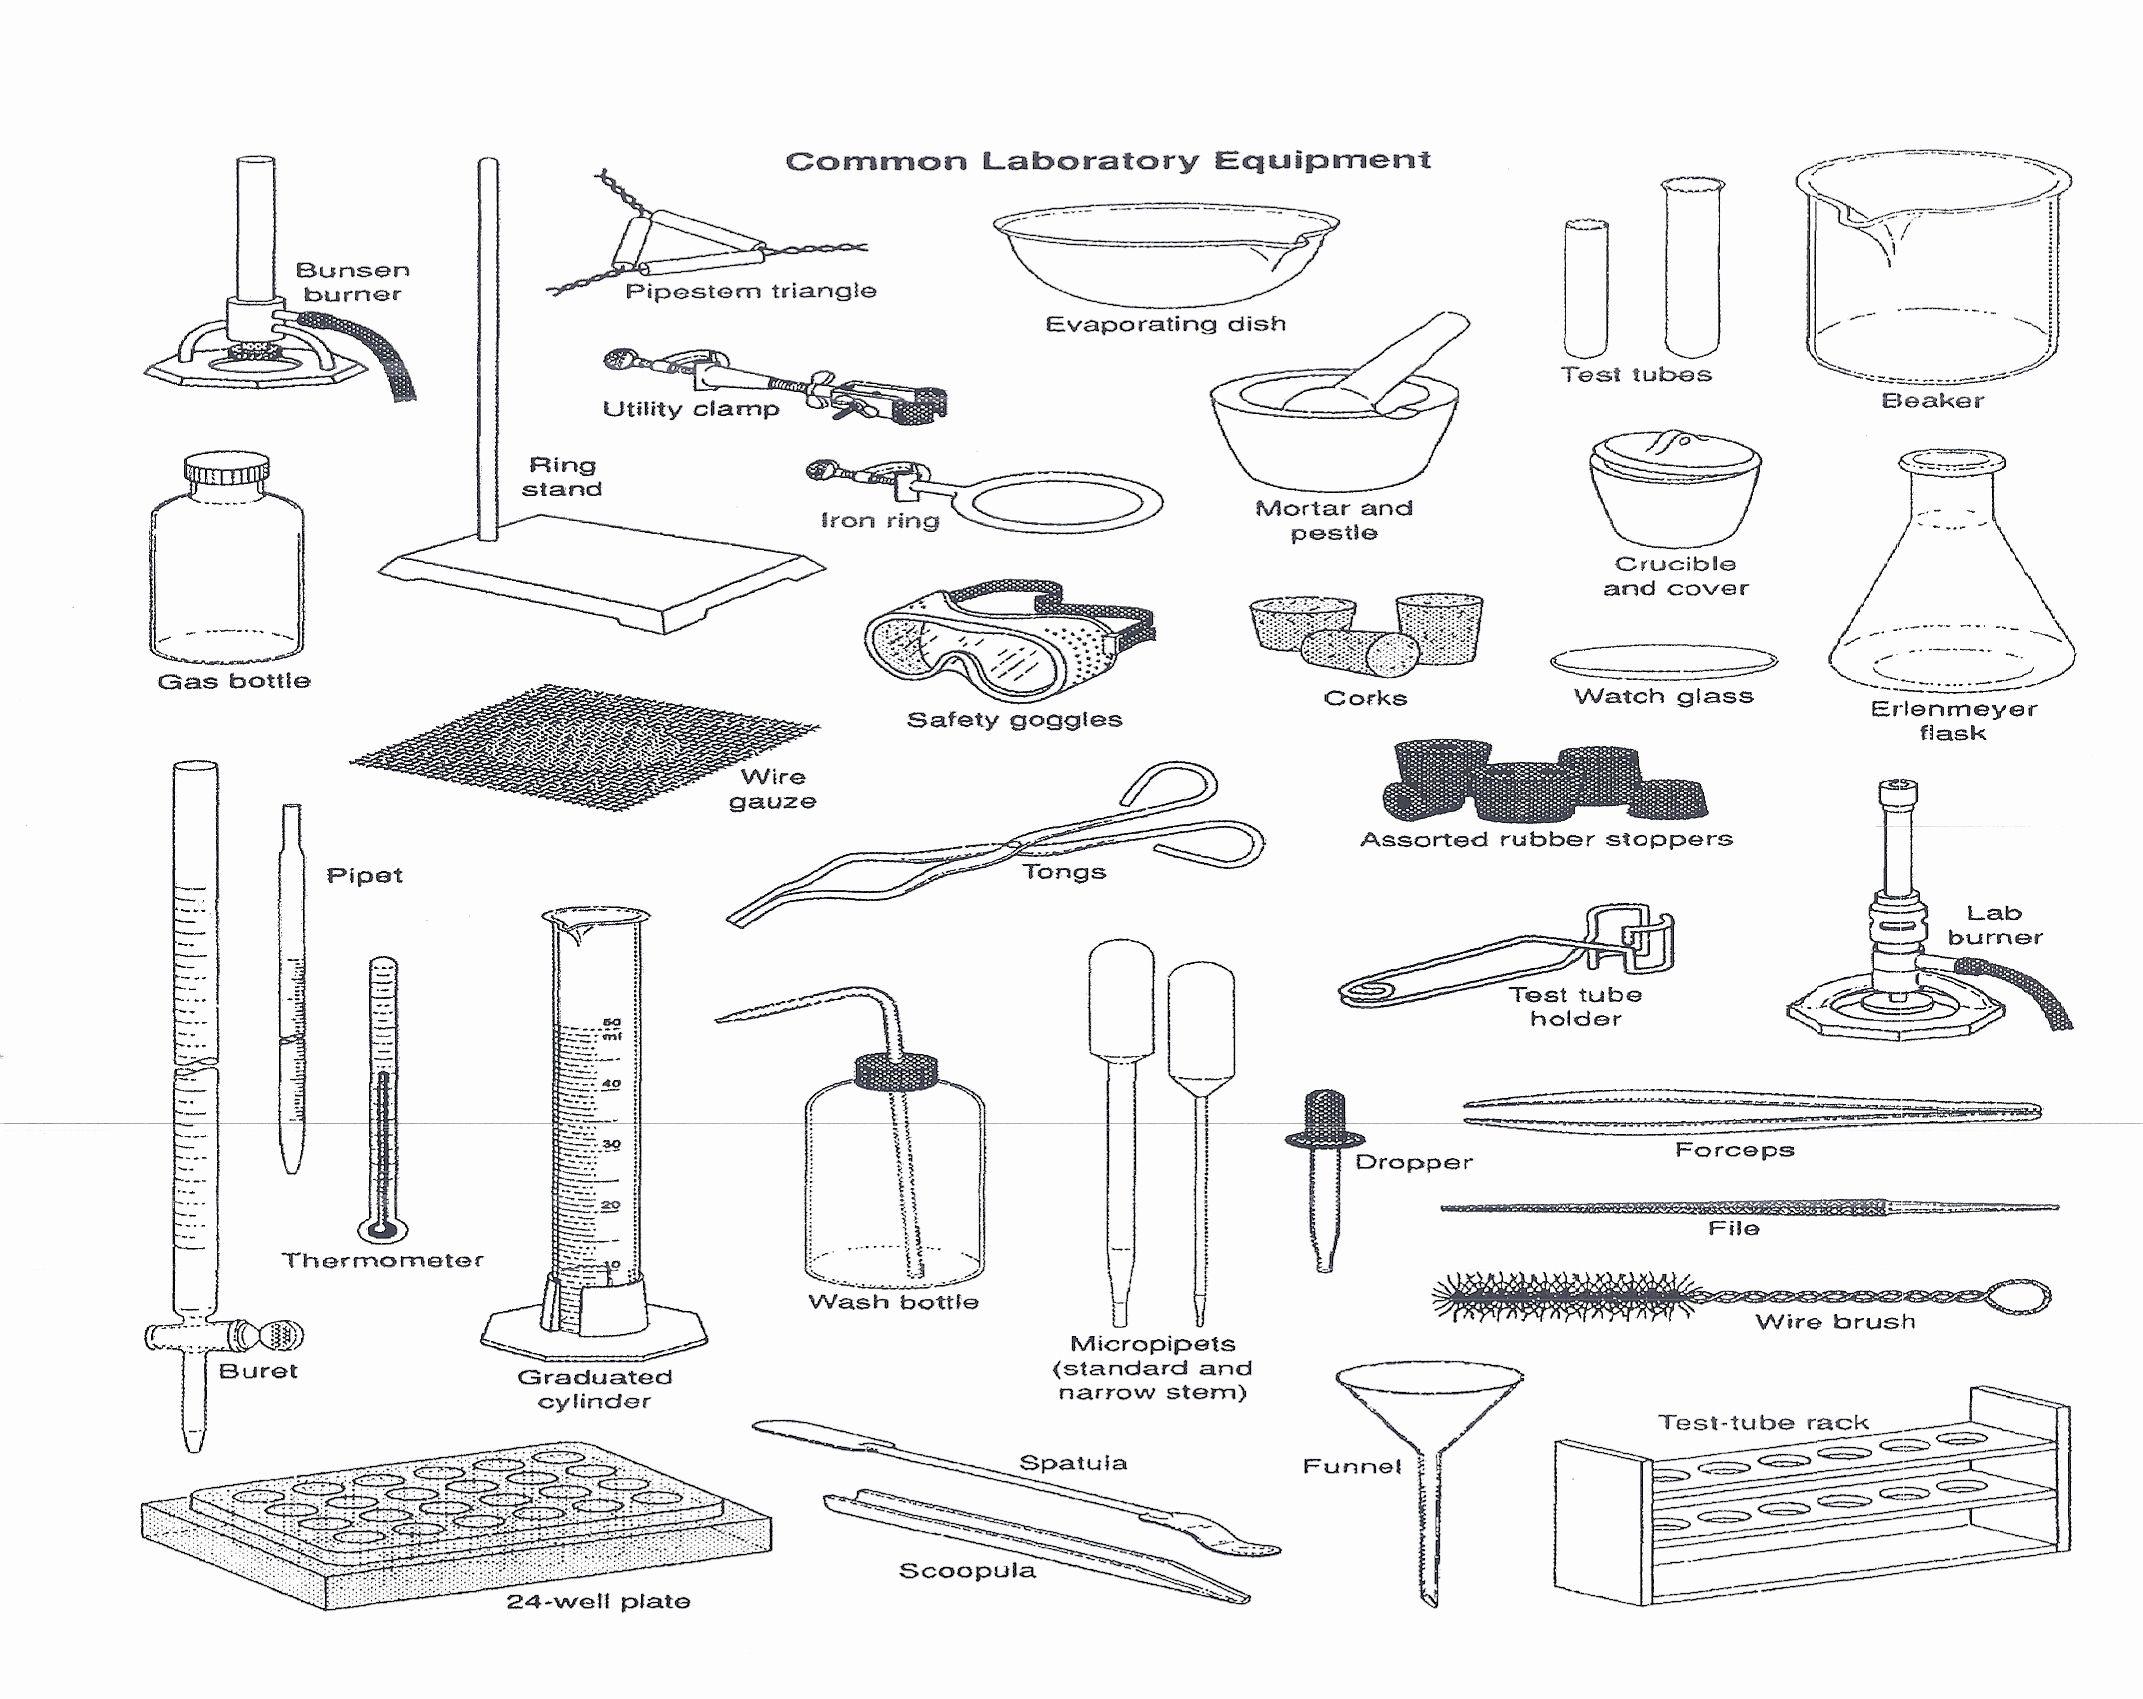 Chemistry Lab Equipment Worksheet Answer Key